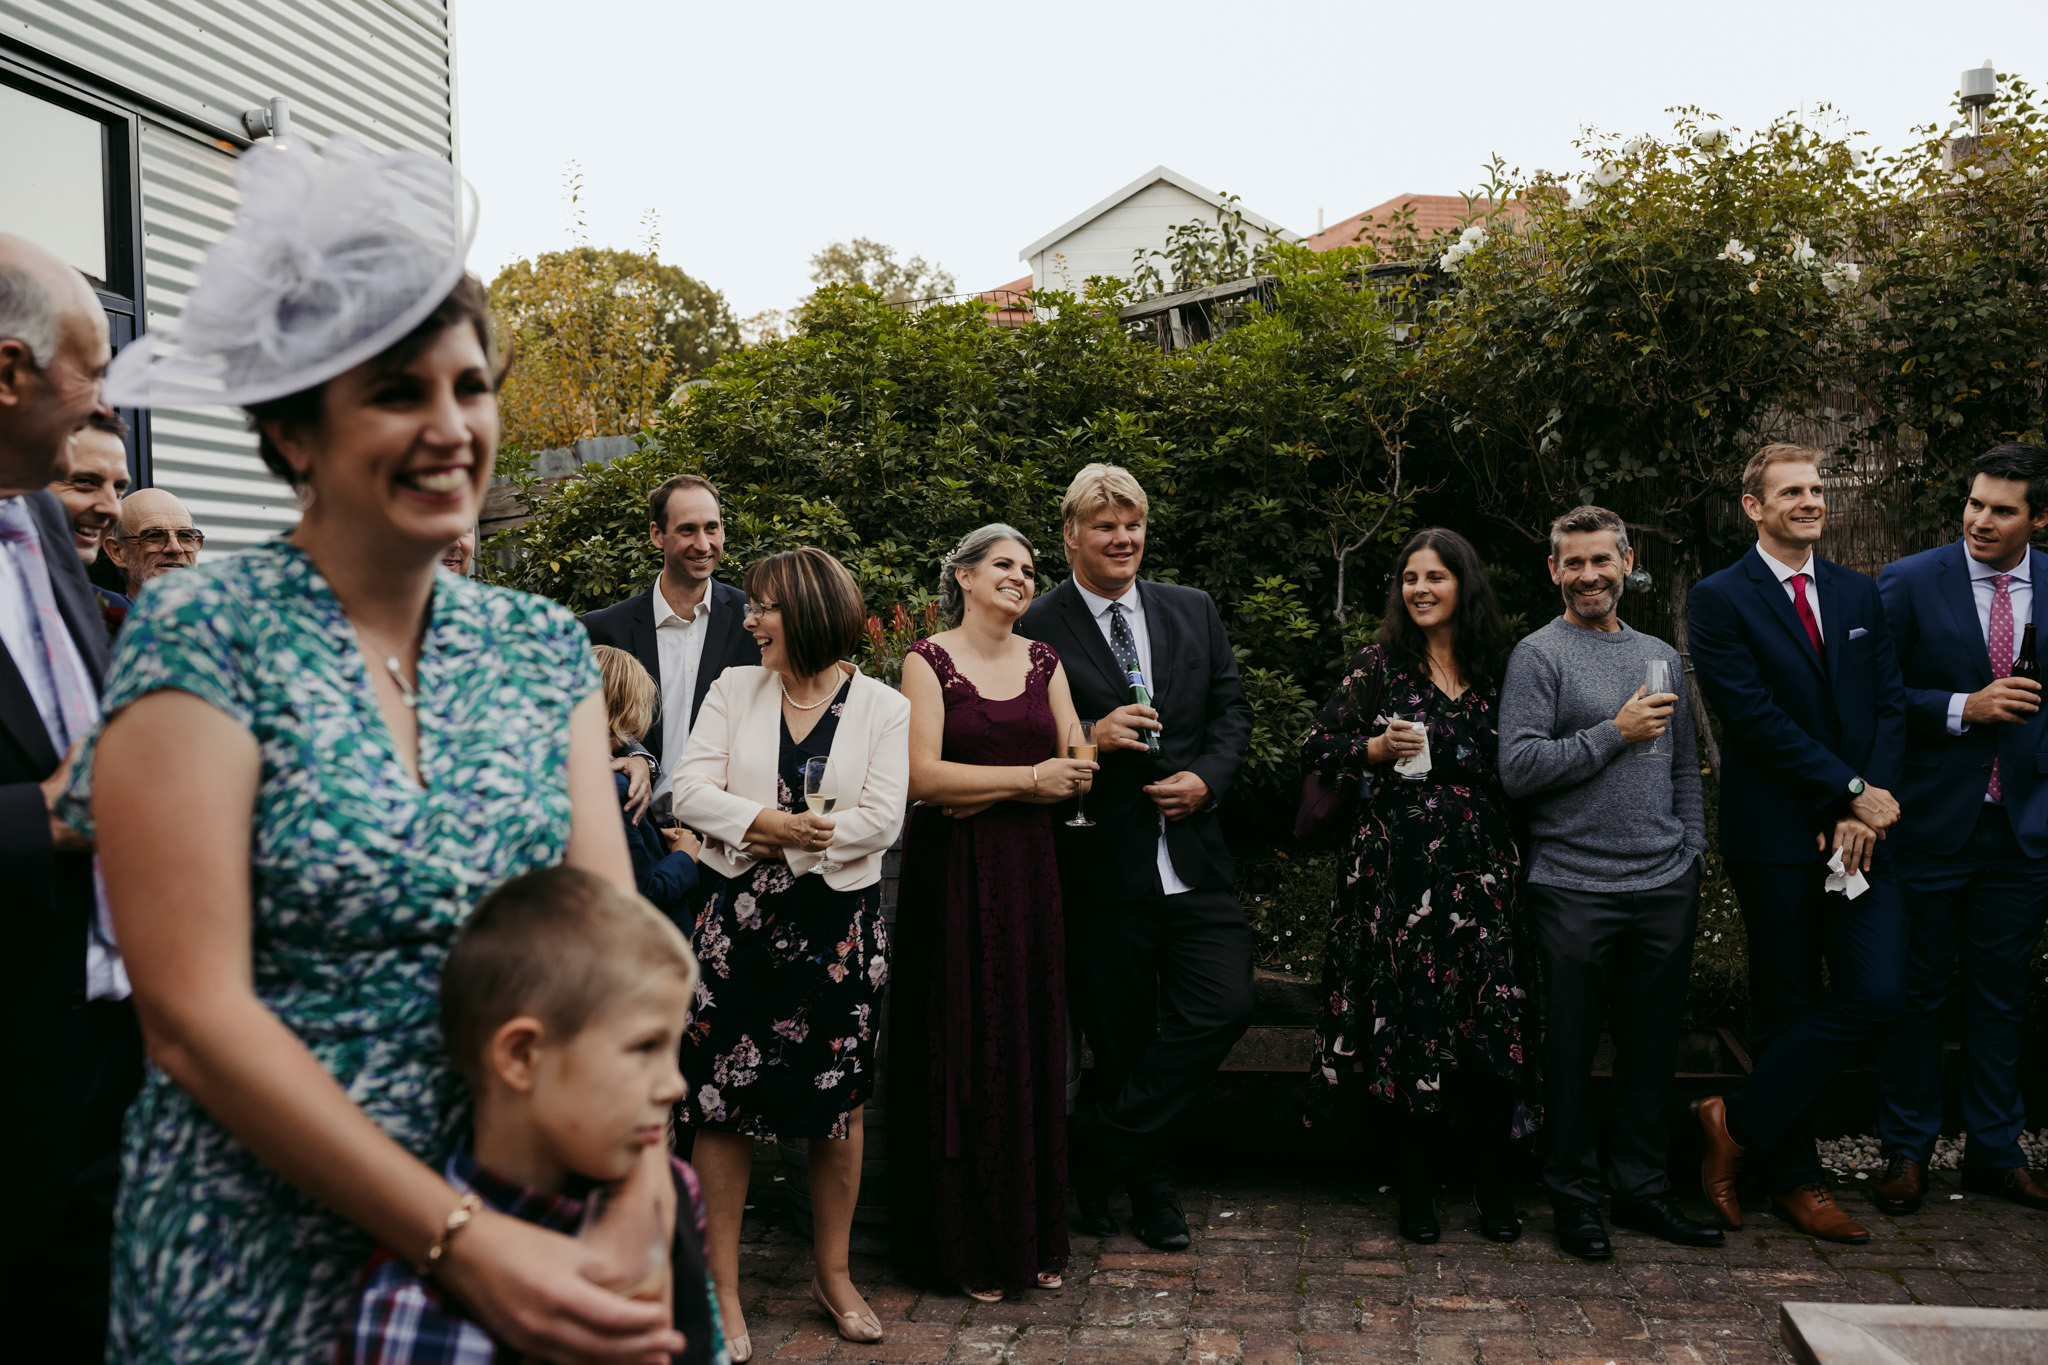 Erin Latimore Mudgee Canberra Wedding Photographer ROSEBANK GUESTHOUSE OLD THEATRE TONIC MILLTHORPE_627.JPG